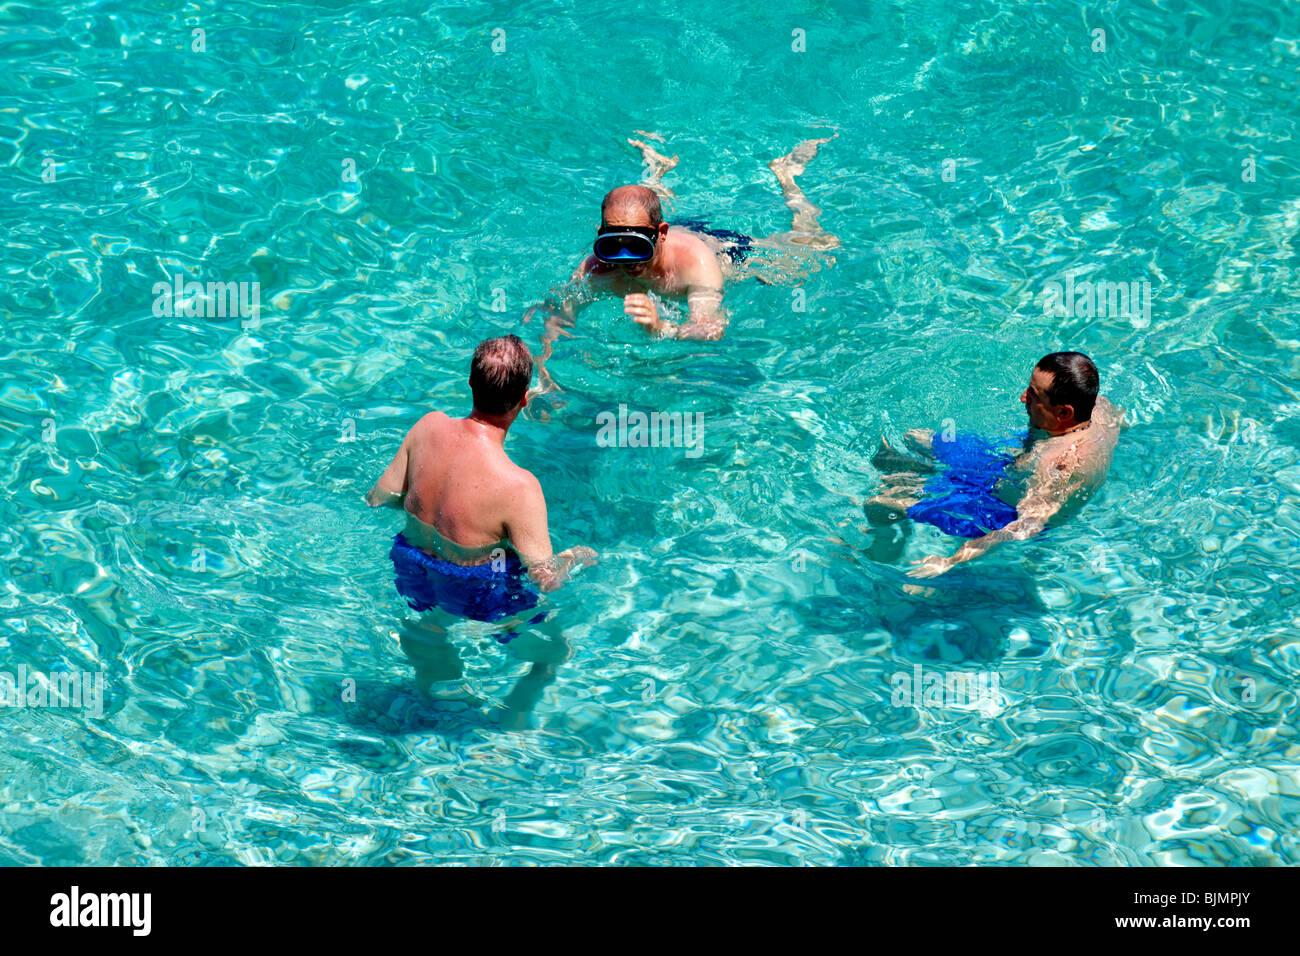 Bucht Strand Schwimmer klares Wasser Riserva Naturale Dello Zingaro Zingaro Naturschutzgebiet Scopello Scopello Stockbild